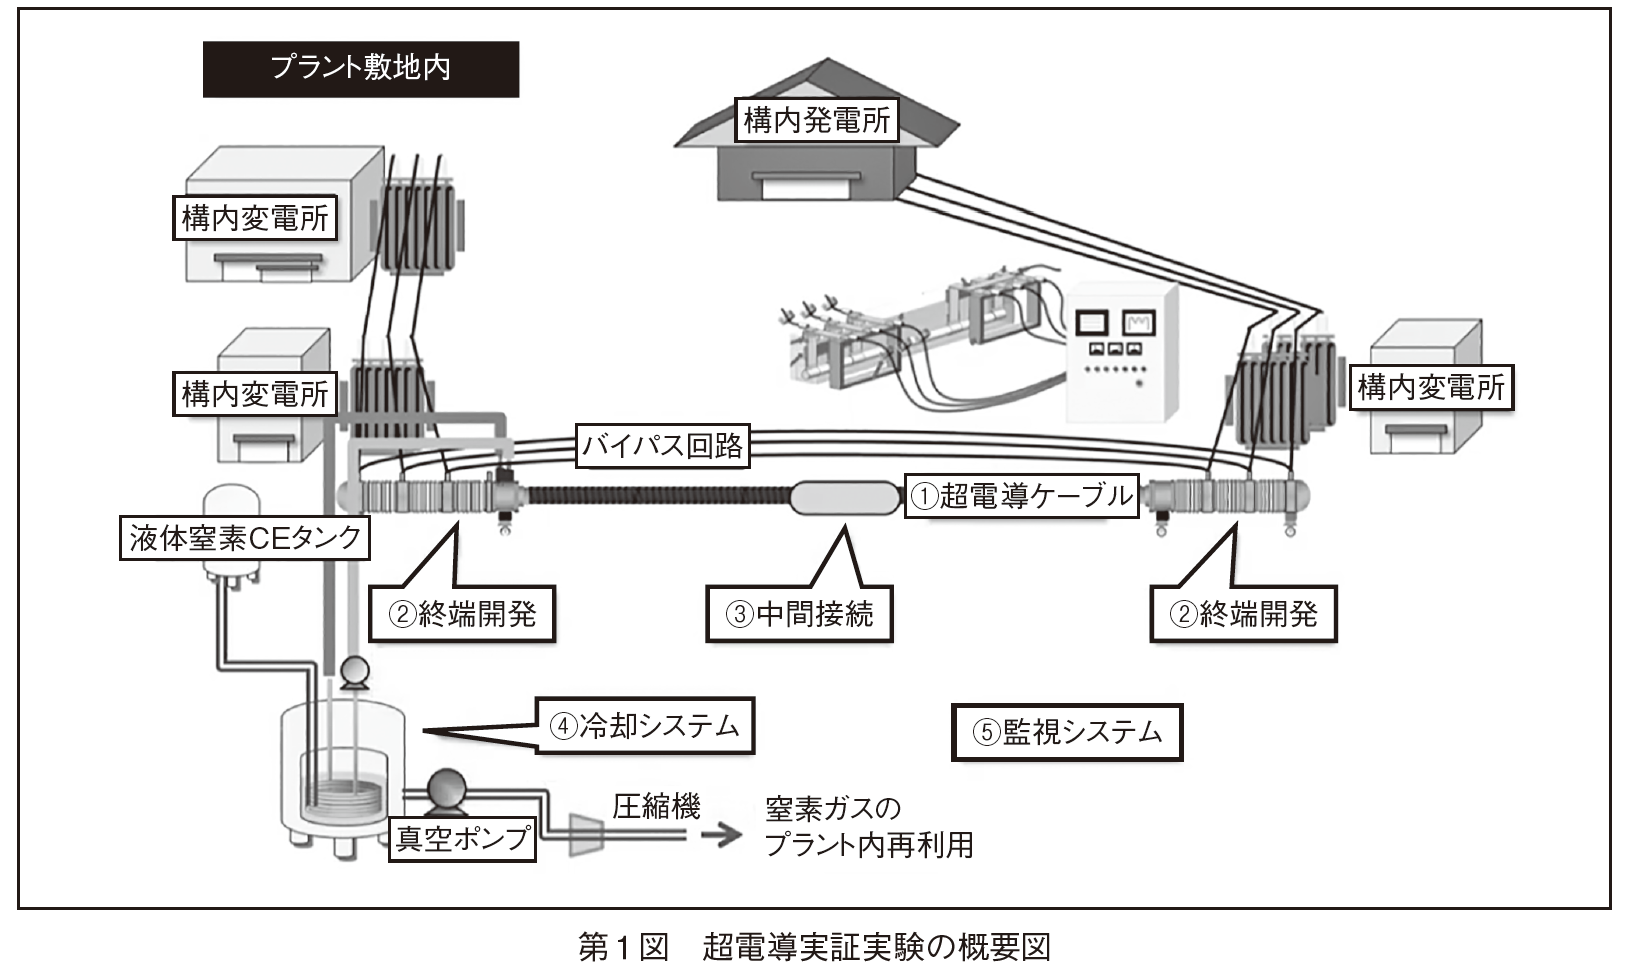 NEDO、昭和電線ケーブルシステム(株)、BASFジャパン(株) 民間プラントに三相同軸超電導ケーブルを敷設の画像